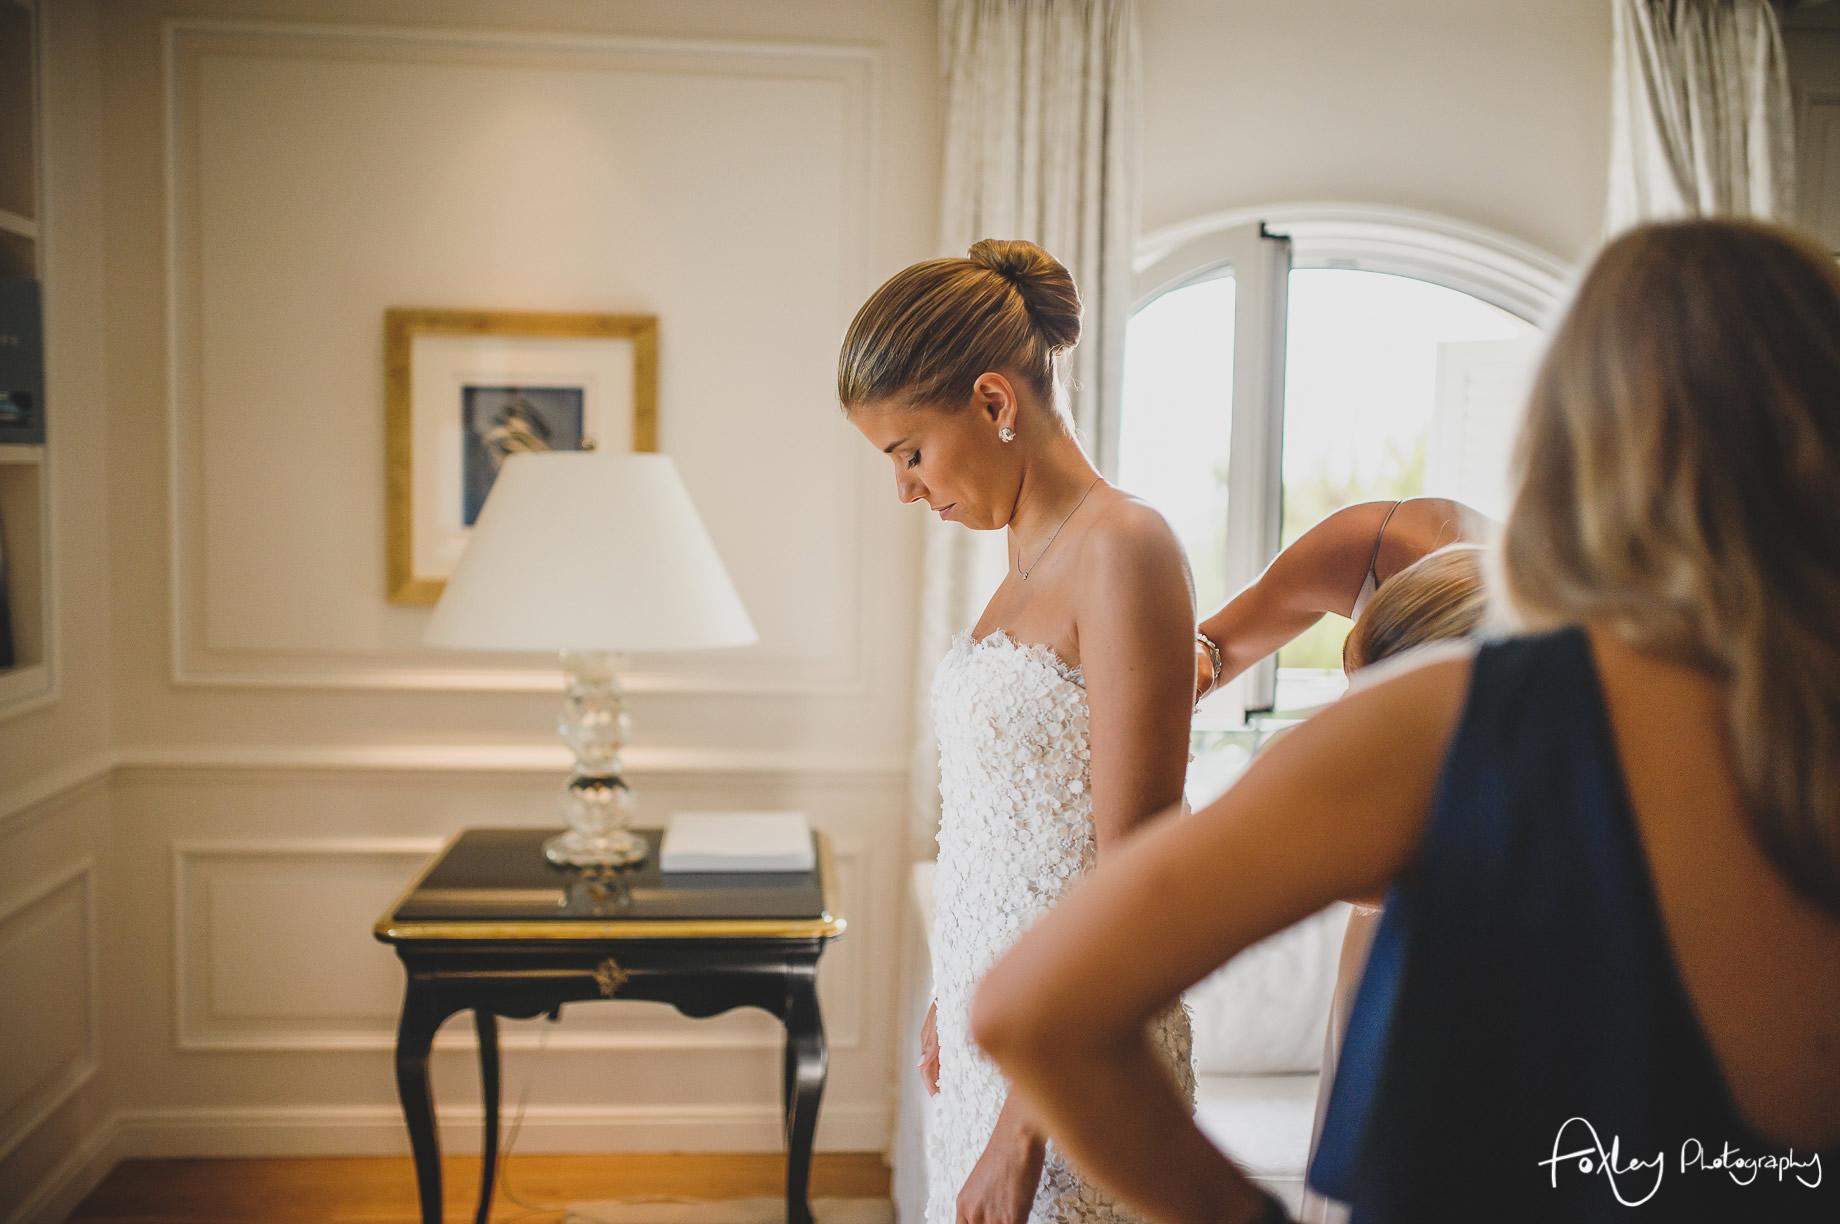 Jil and Will's Wedding at Villa Ephrussi De Rothschild 036